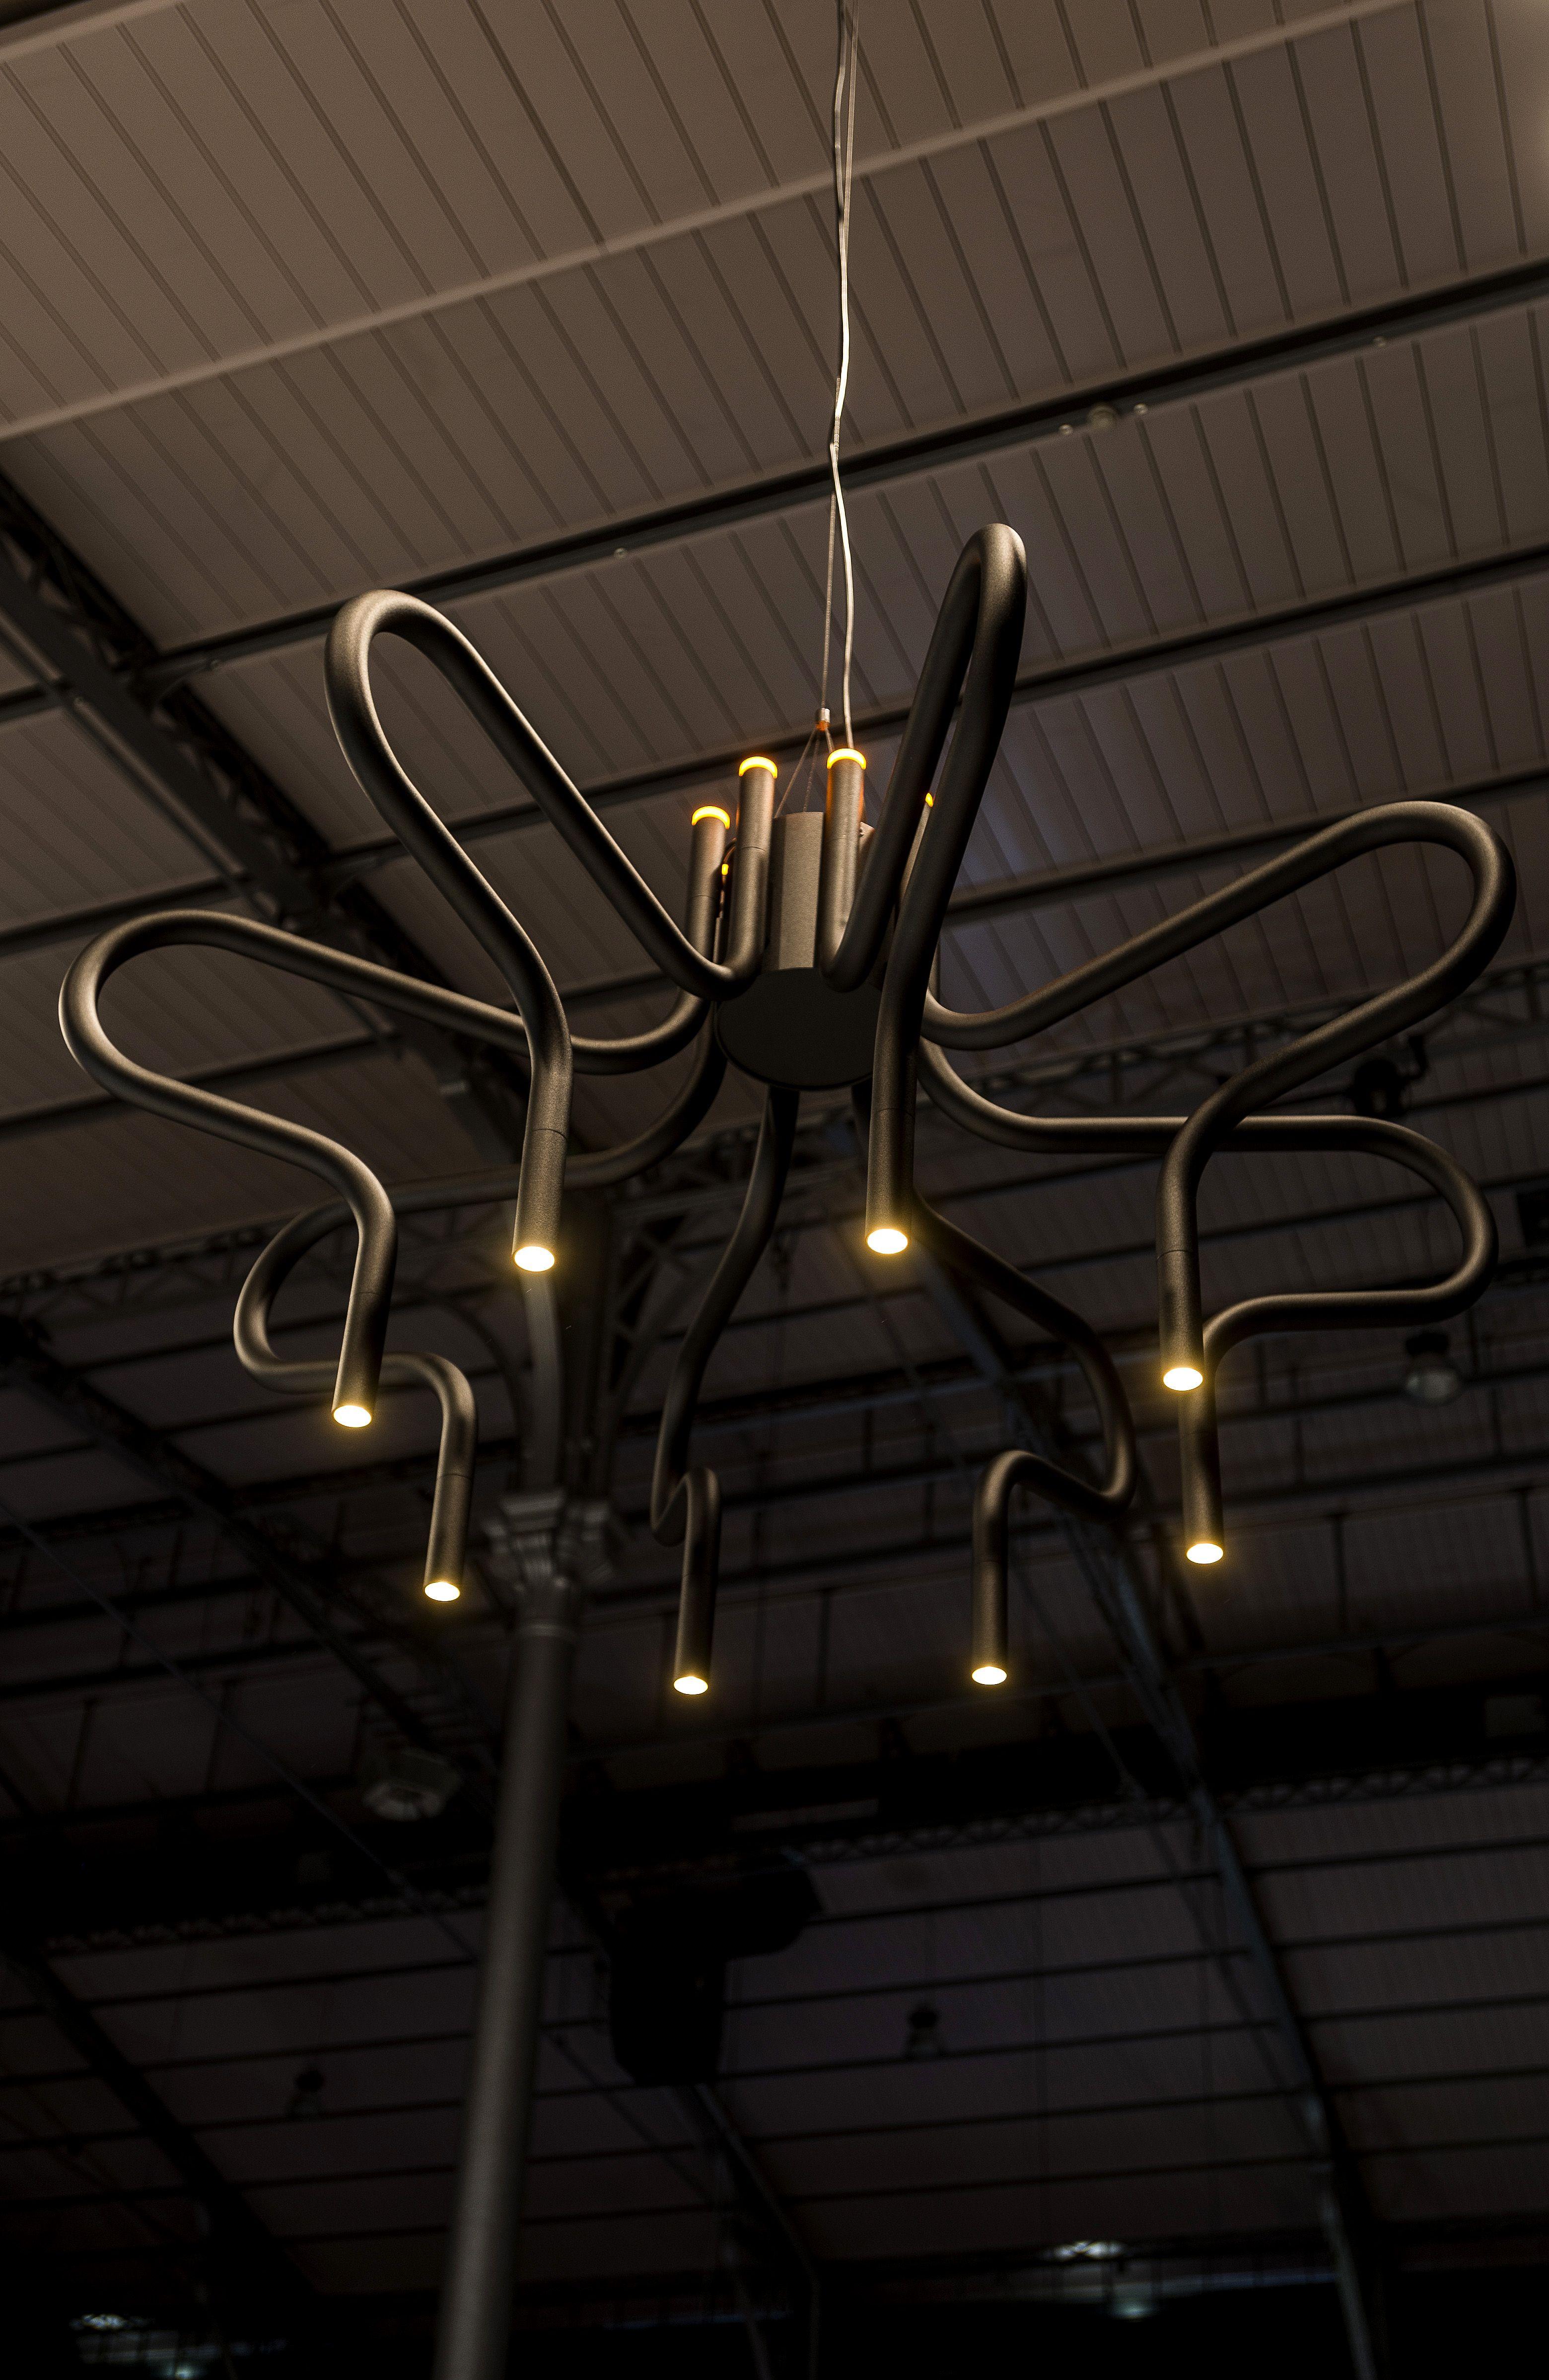 King george tal lighting design chandelier lampylampy king george tal lighting design chandelier arubaitofo Gallery